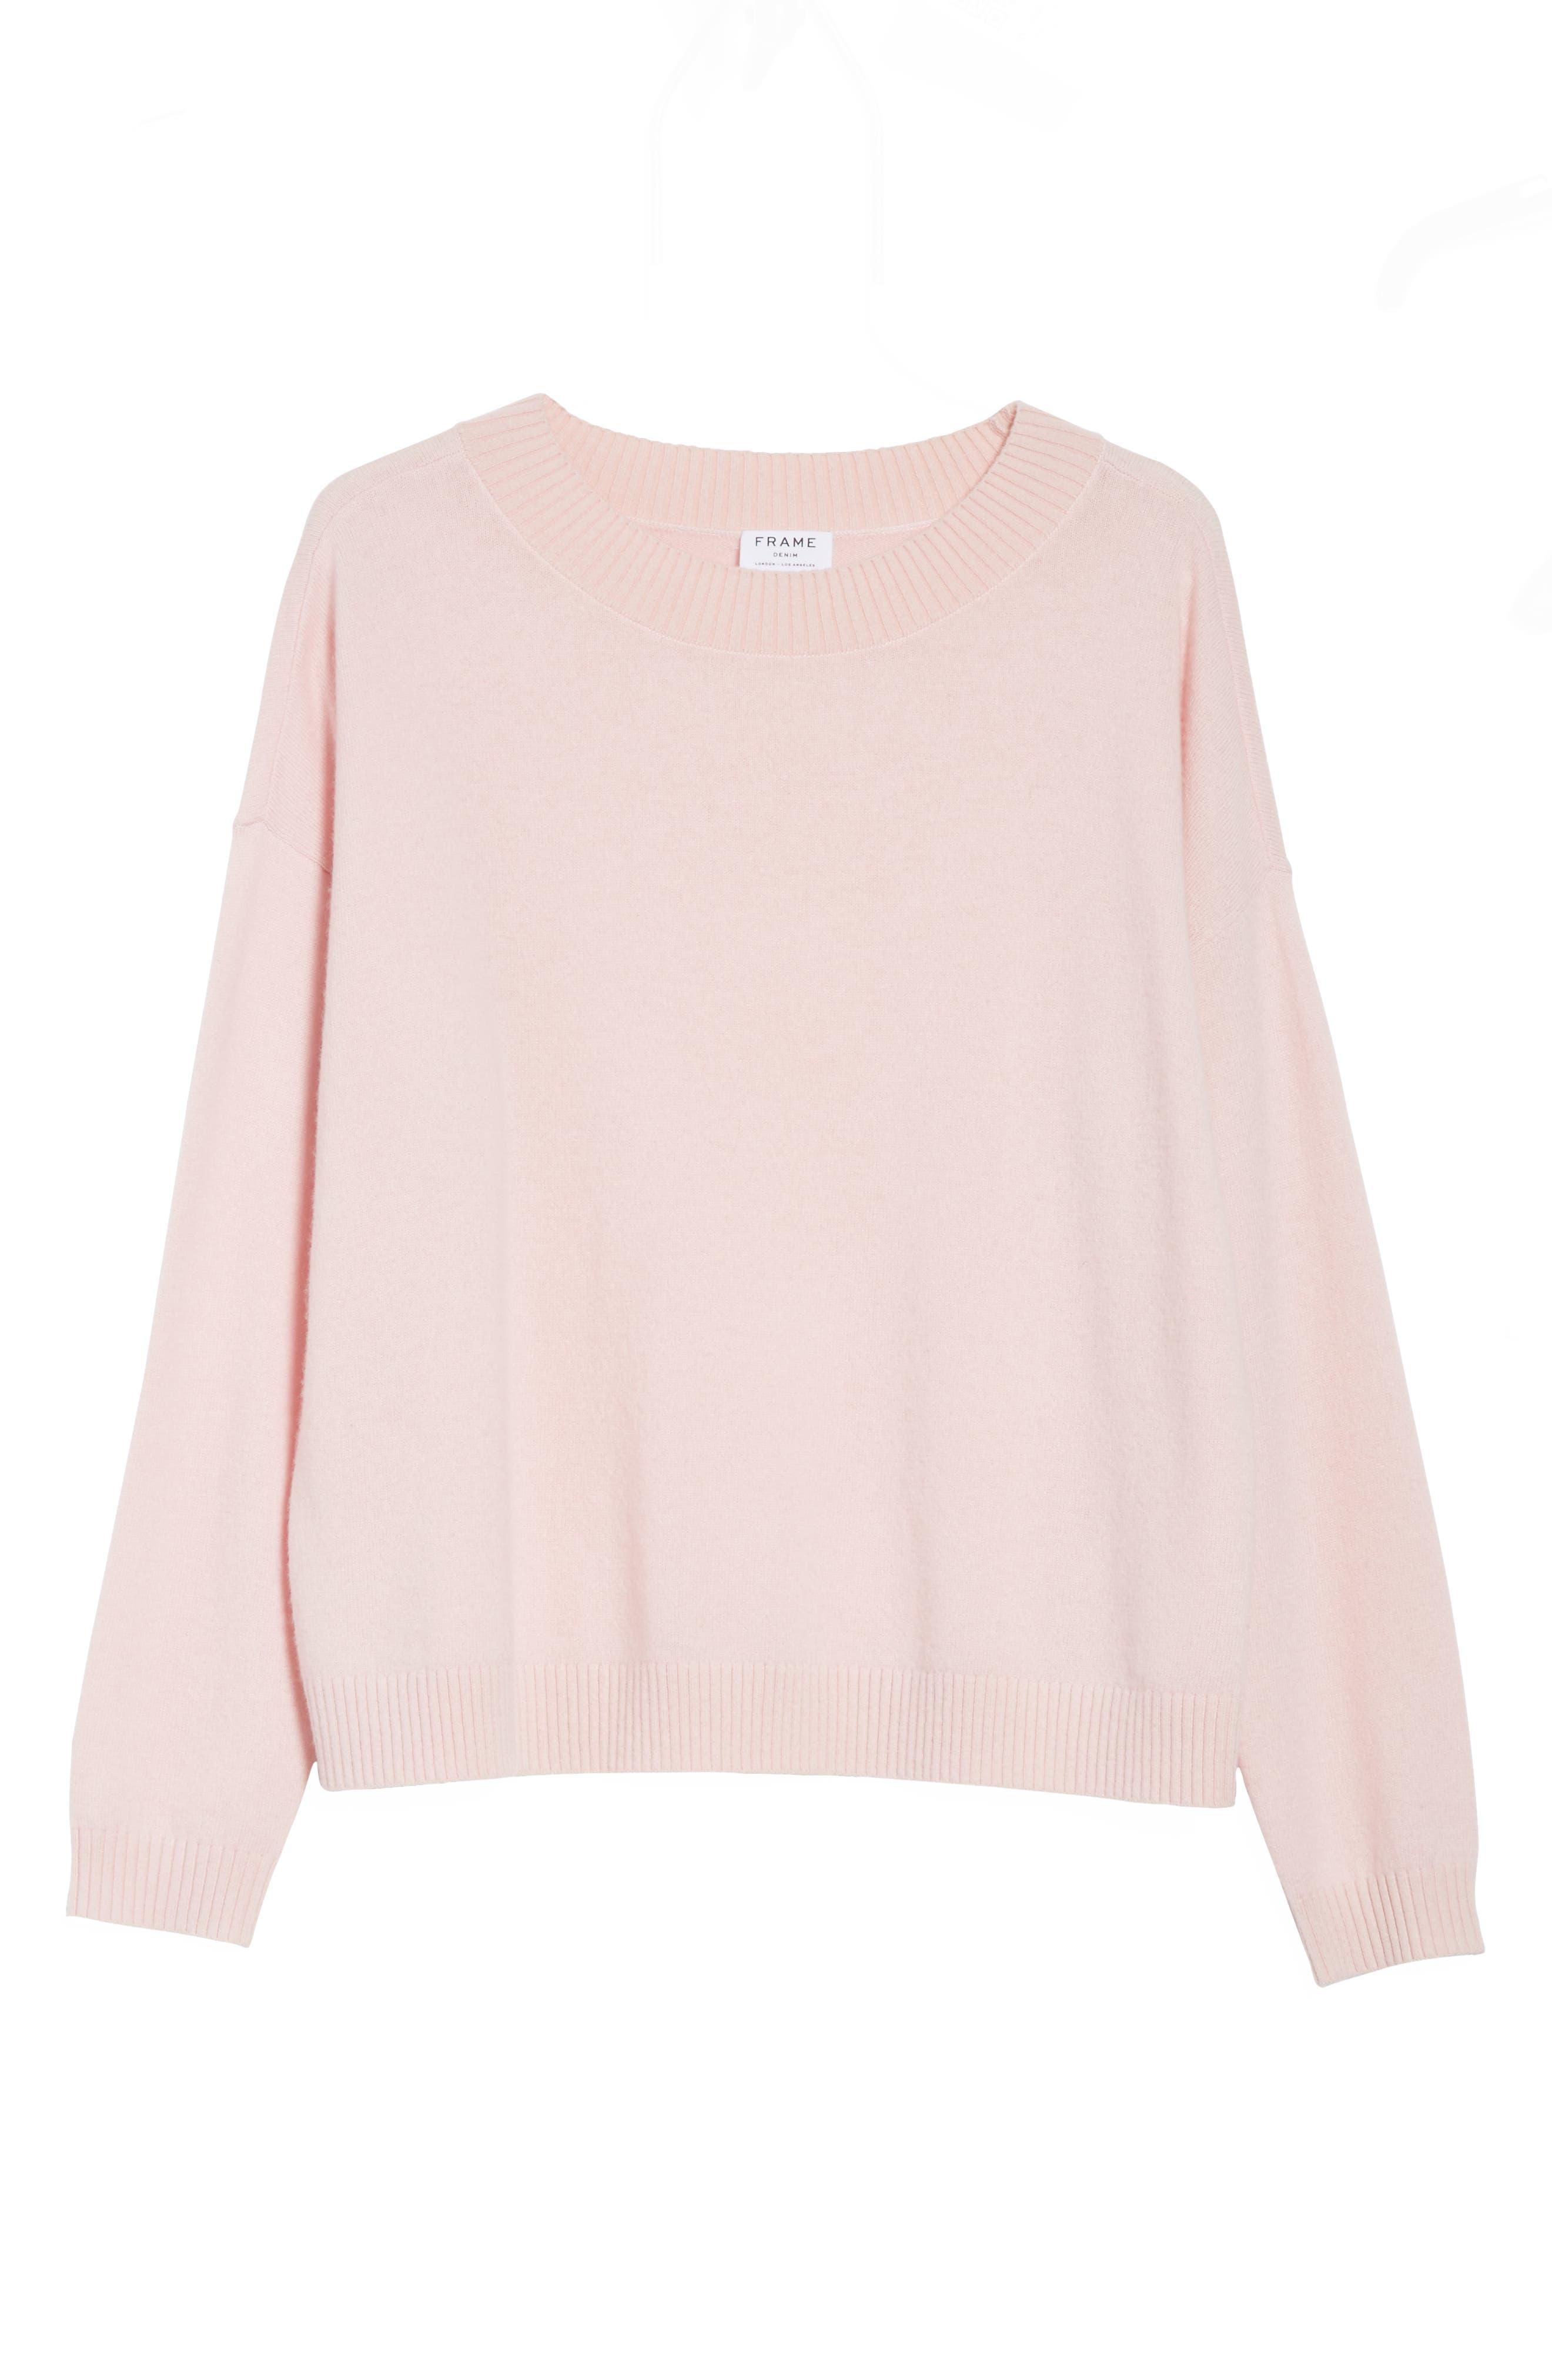 Boyfriend Sweater,                             Alternate thumbnail 6, color,                             650